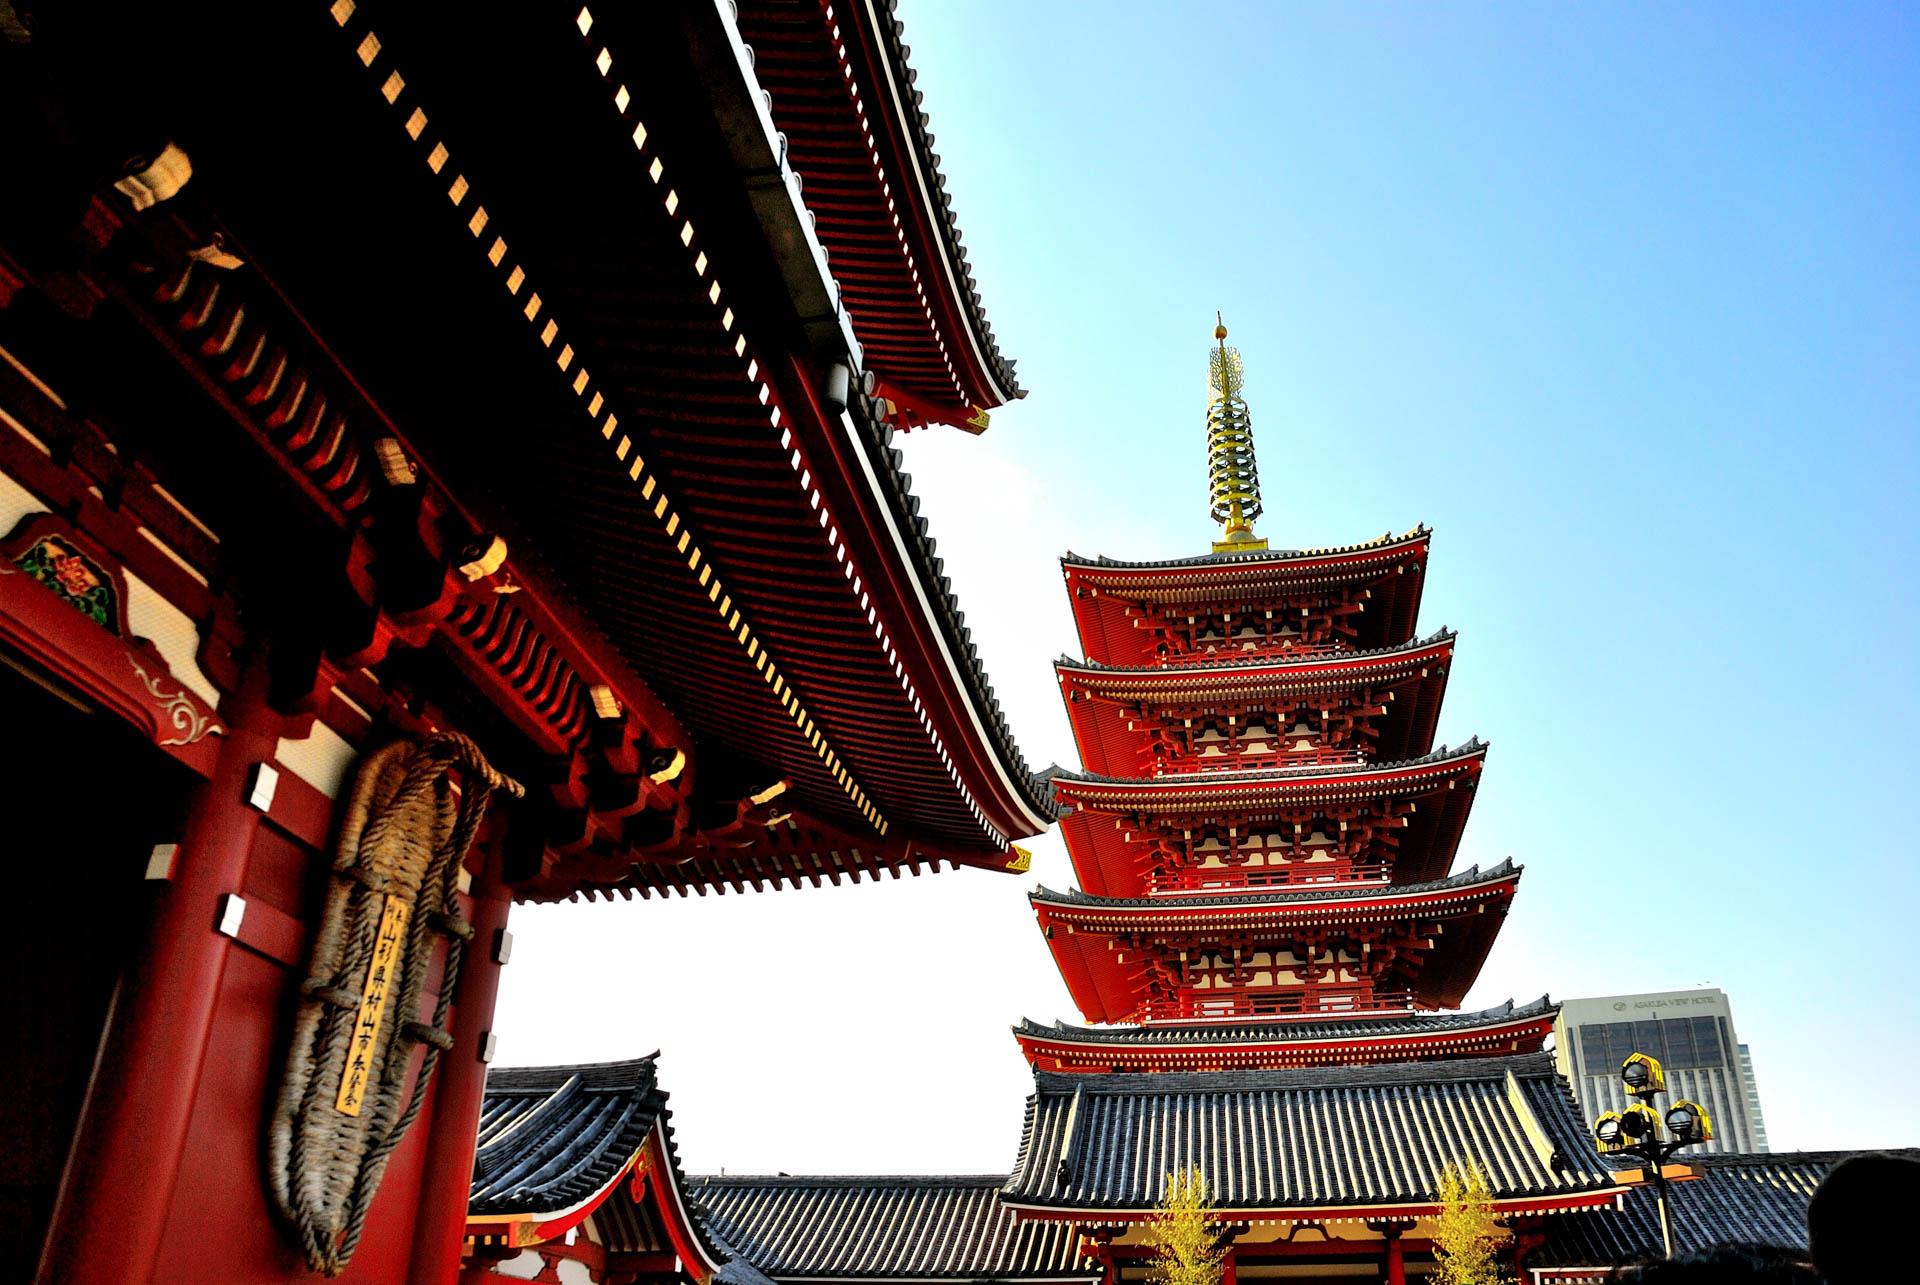 Tokyo, Japan - Asakusa Sensoji Temple